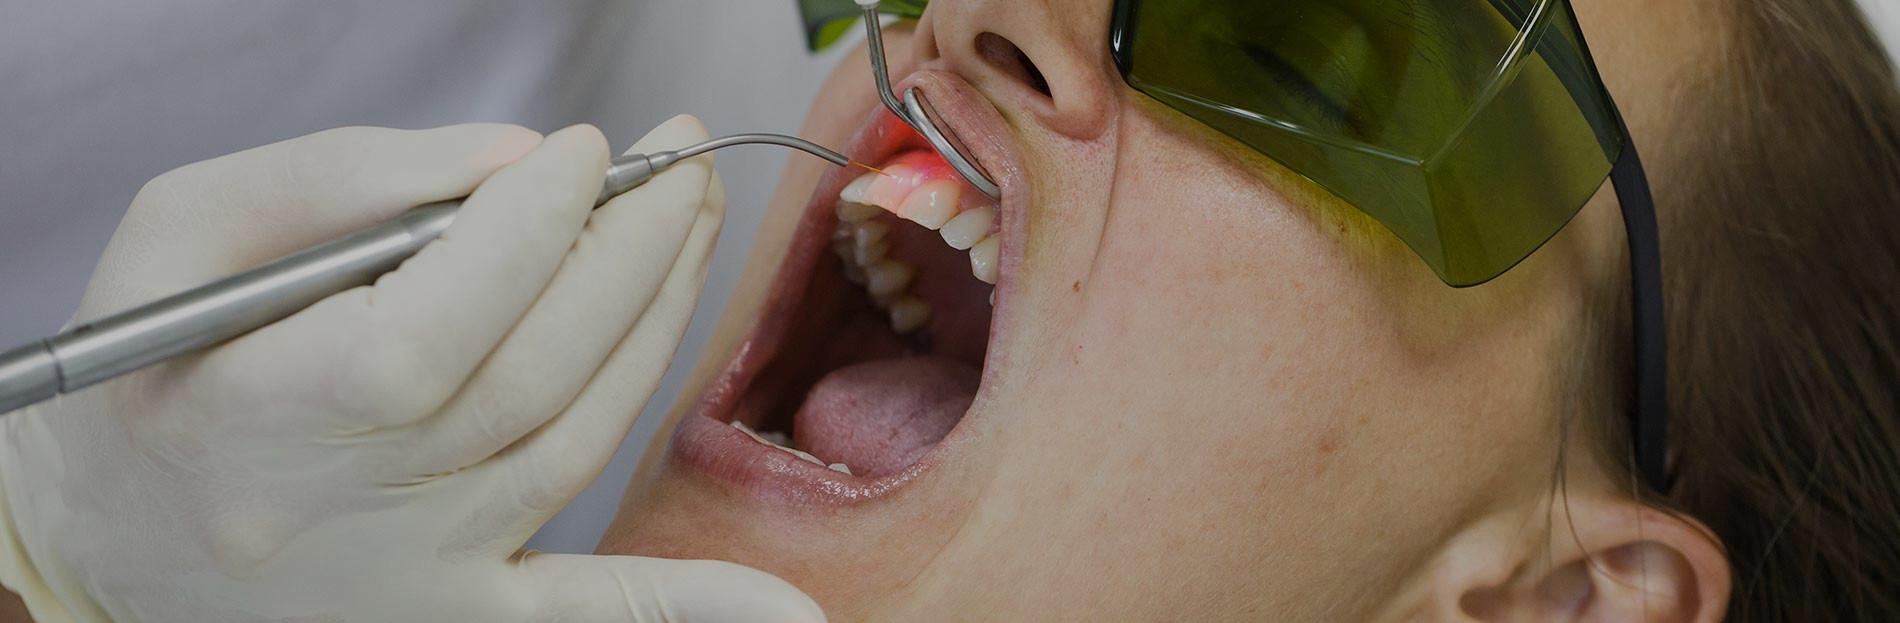 Laser Dentistry Minimally Invasive Procedure